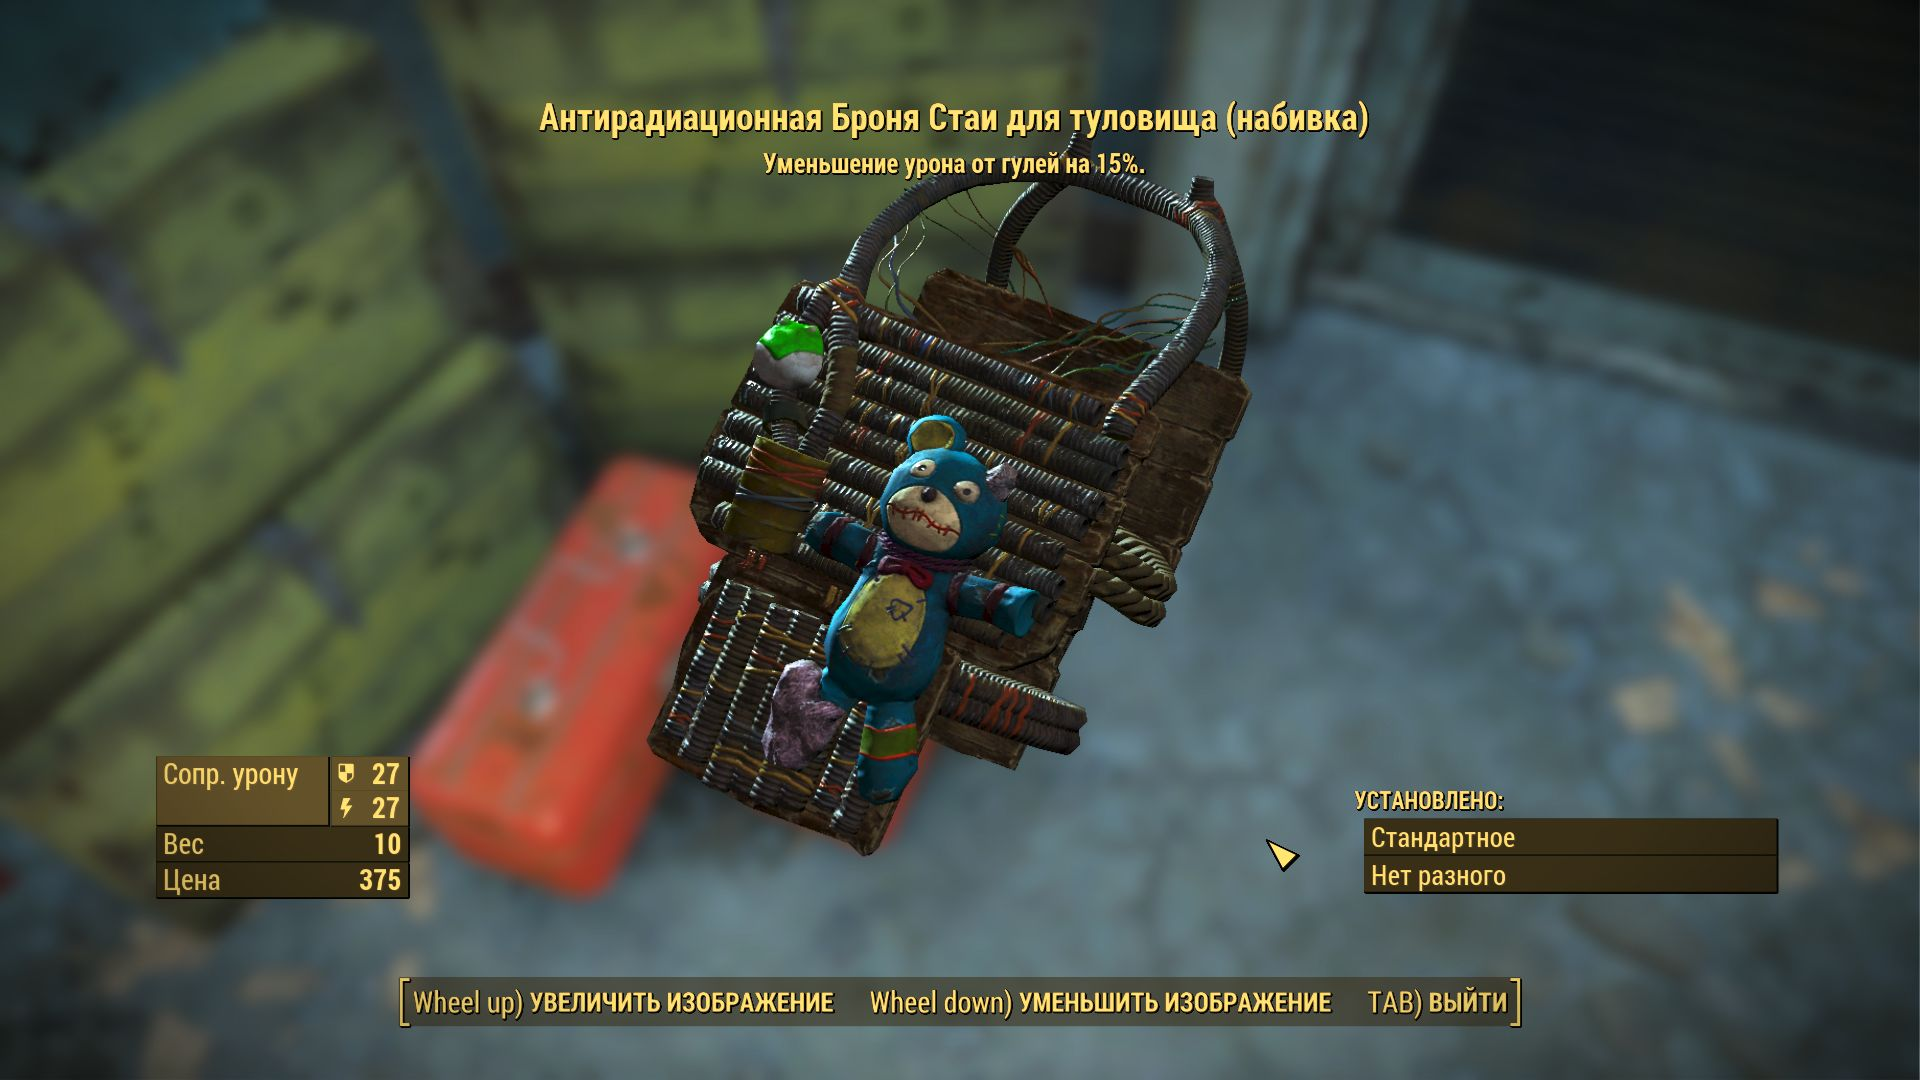 Легендарная Броня Стаи для туловища (набивка) - Fallout 4 броня, легендарная, рейдеры, Стая, Ядер мир